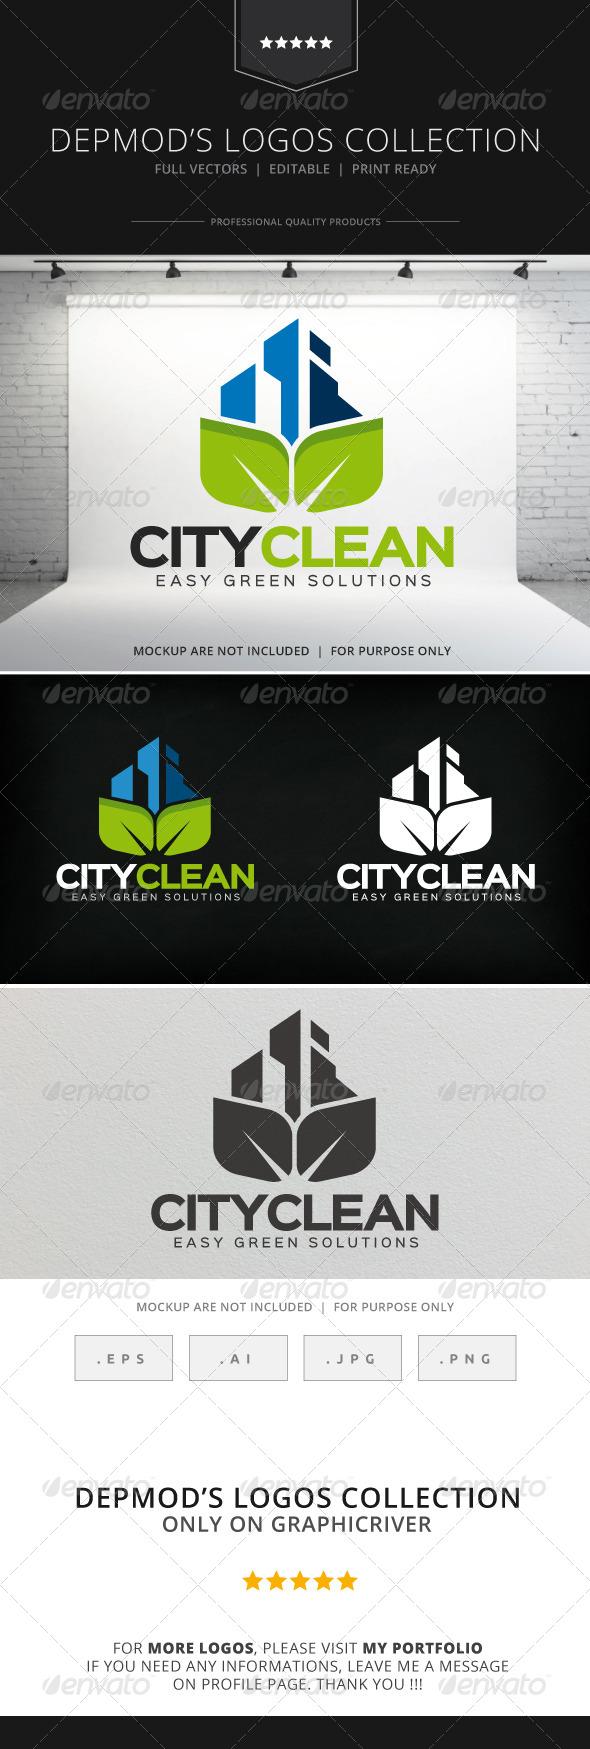 City Clean Logo